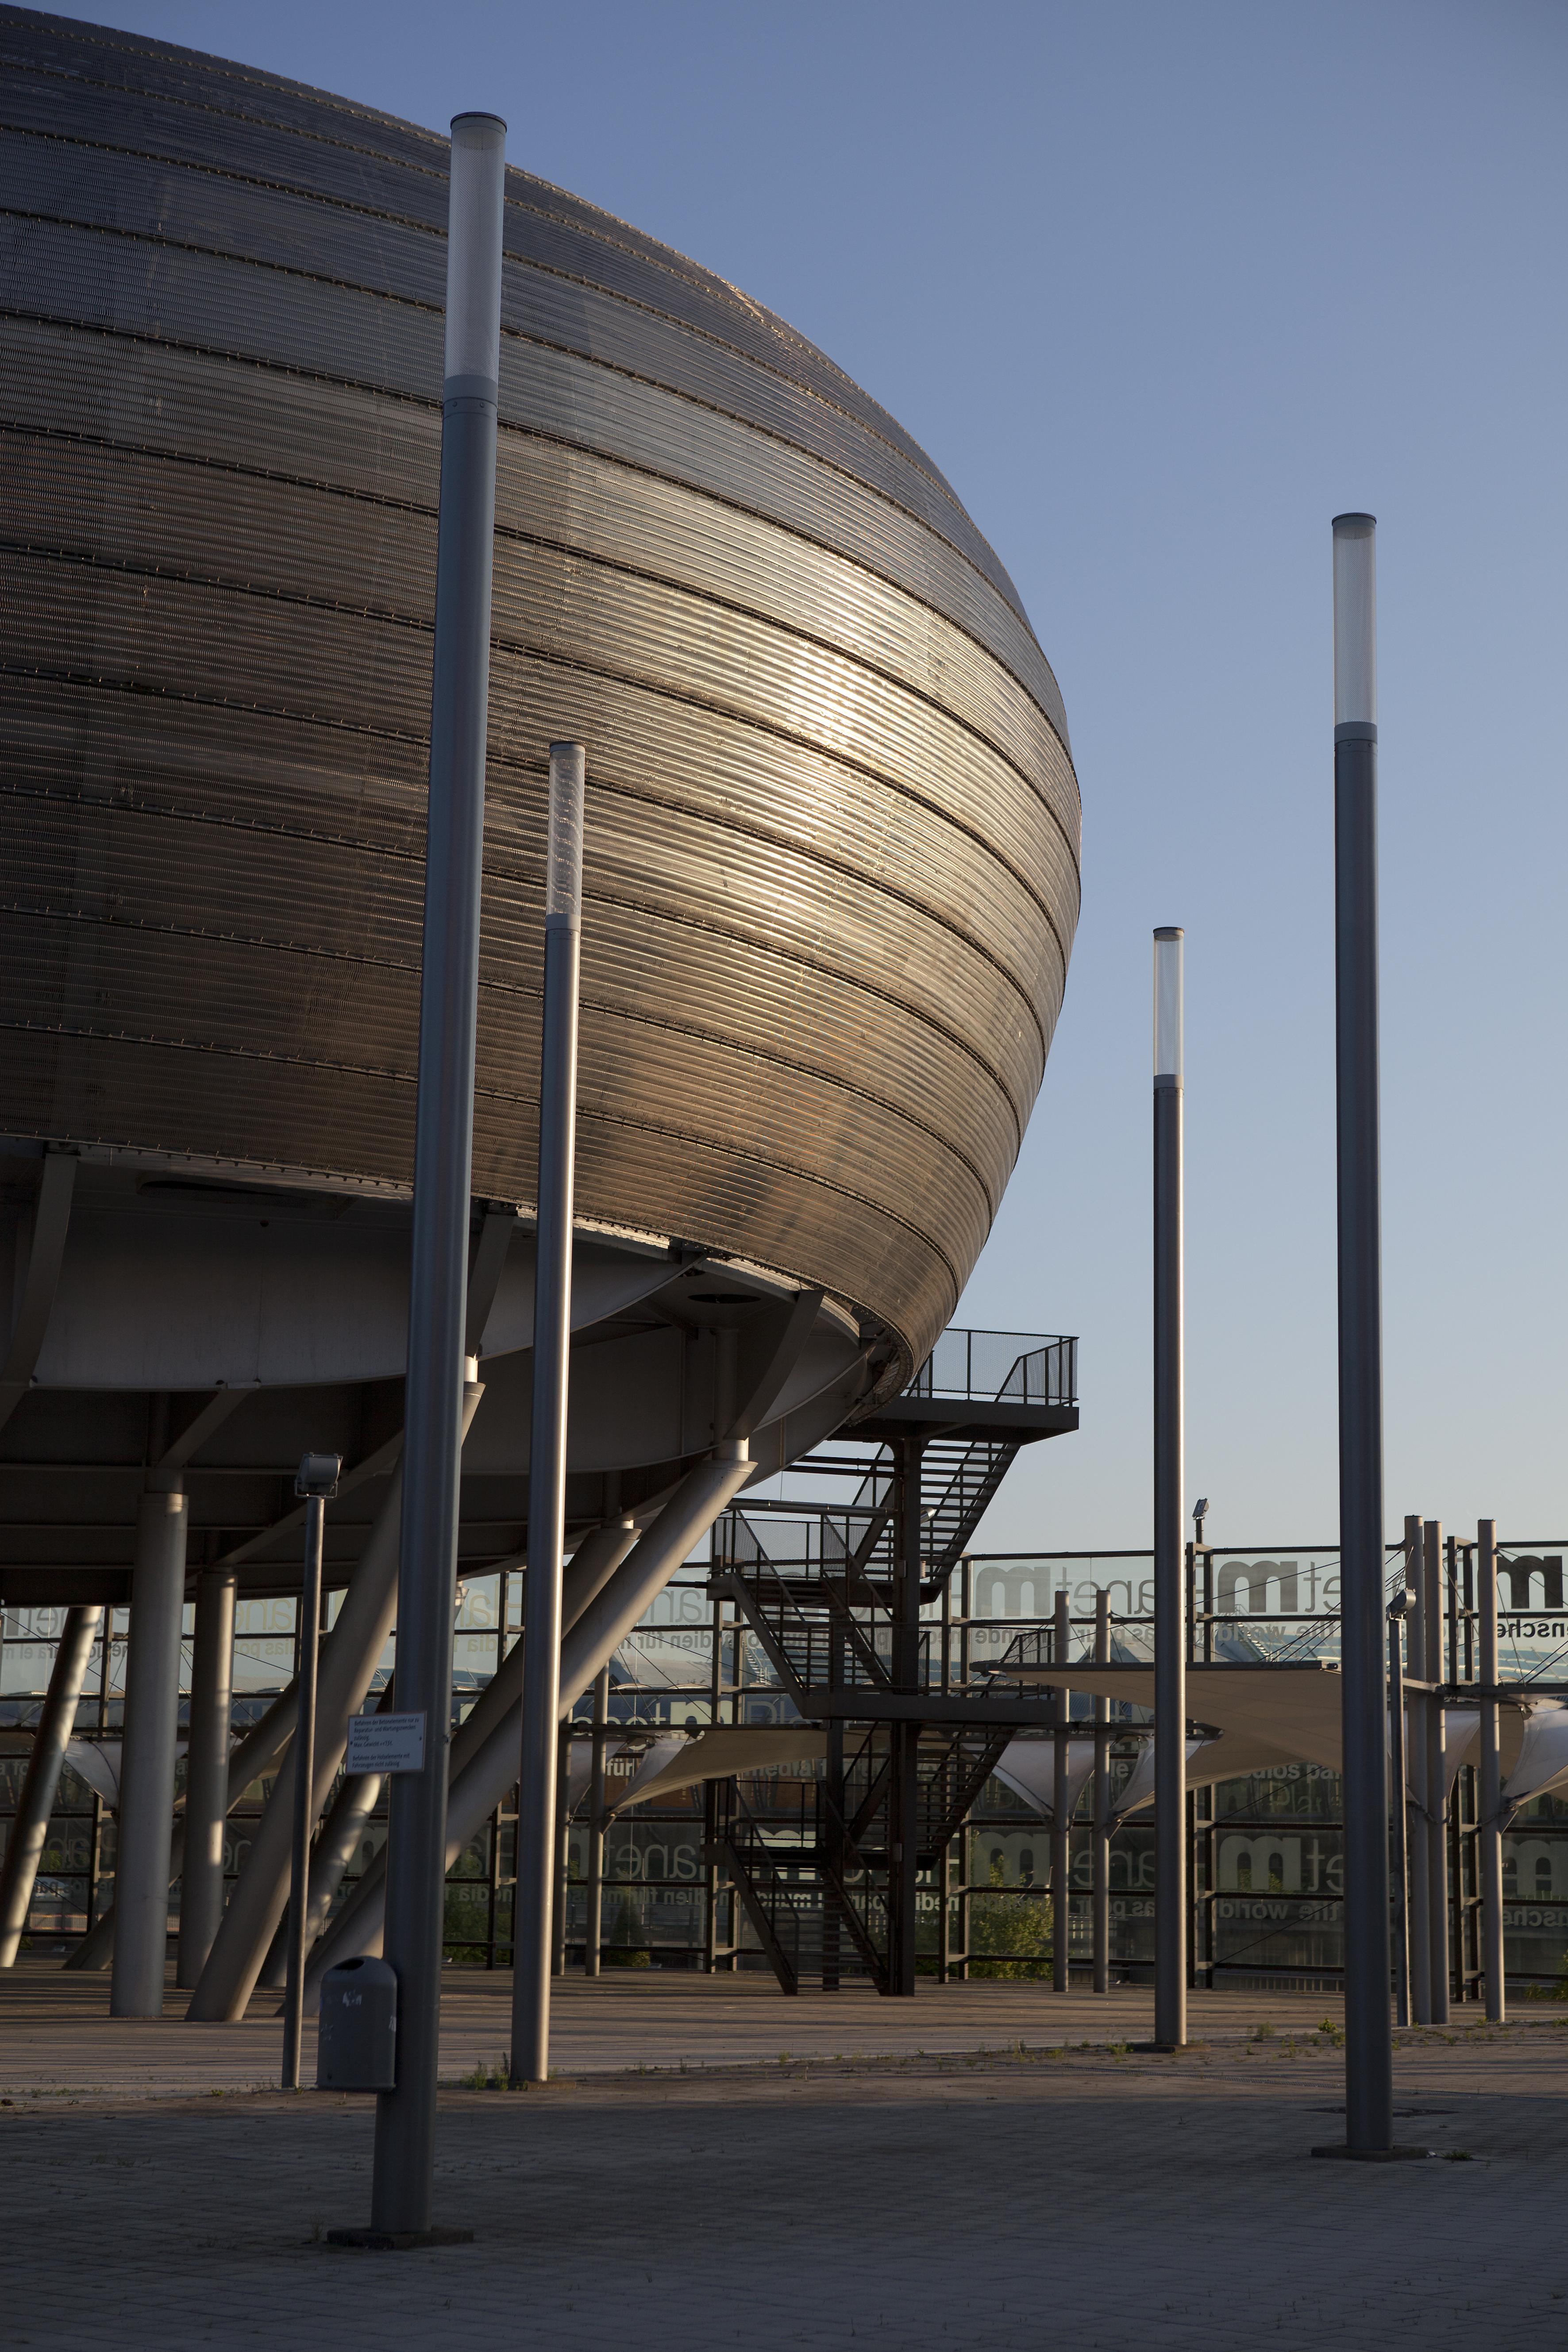 Forschungscluster der Hochschule Hannover